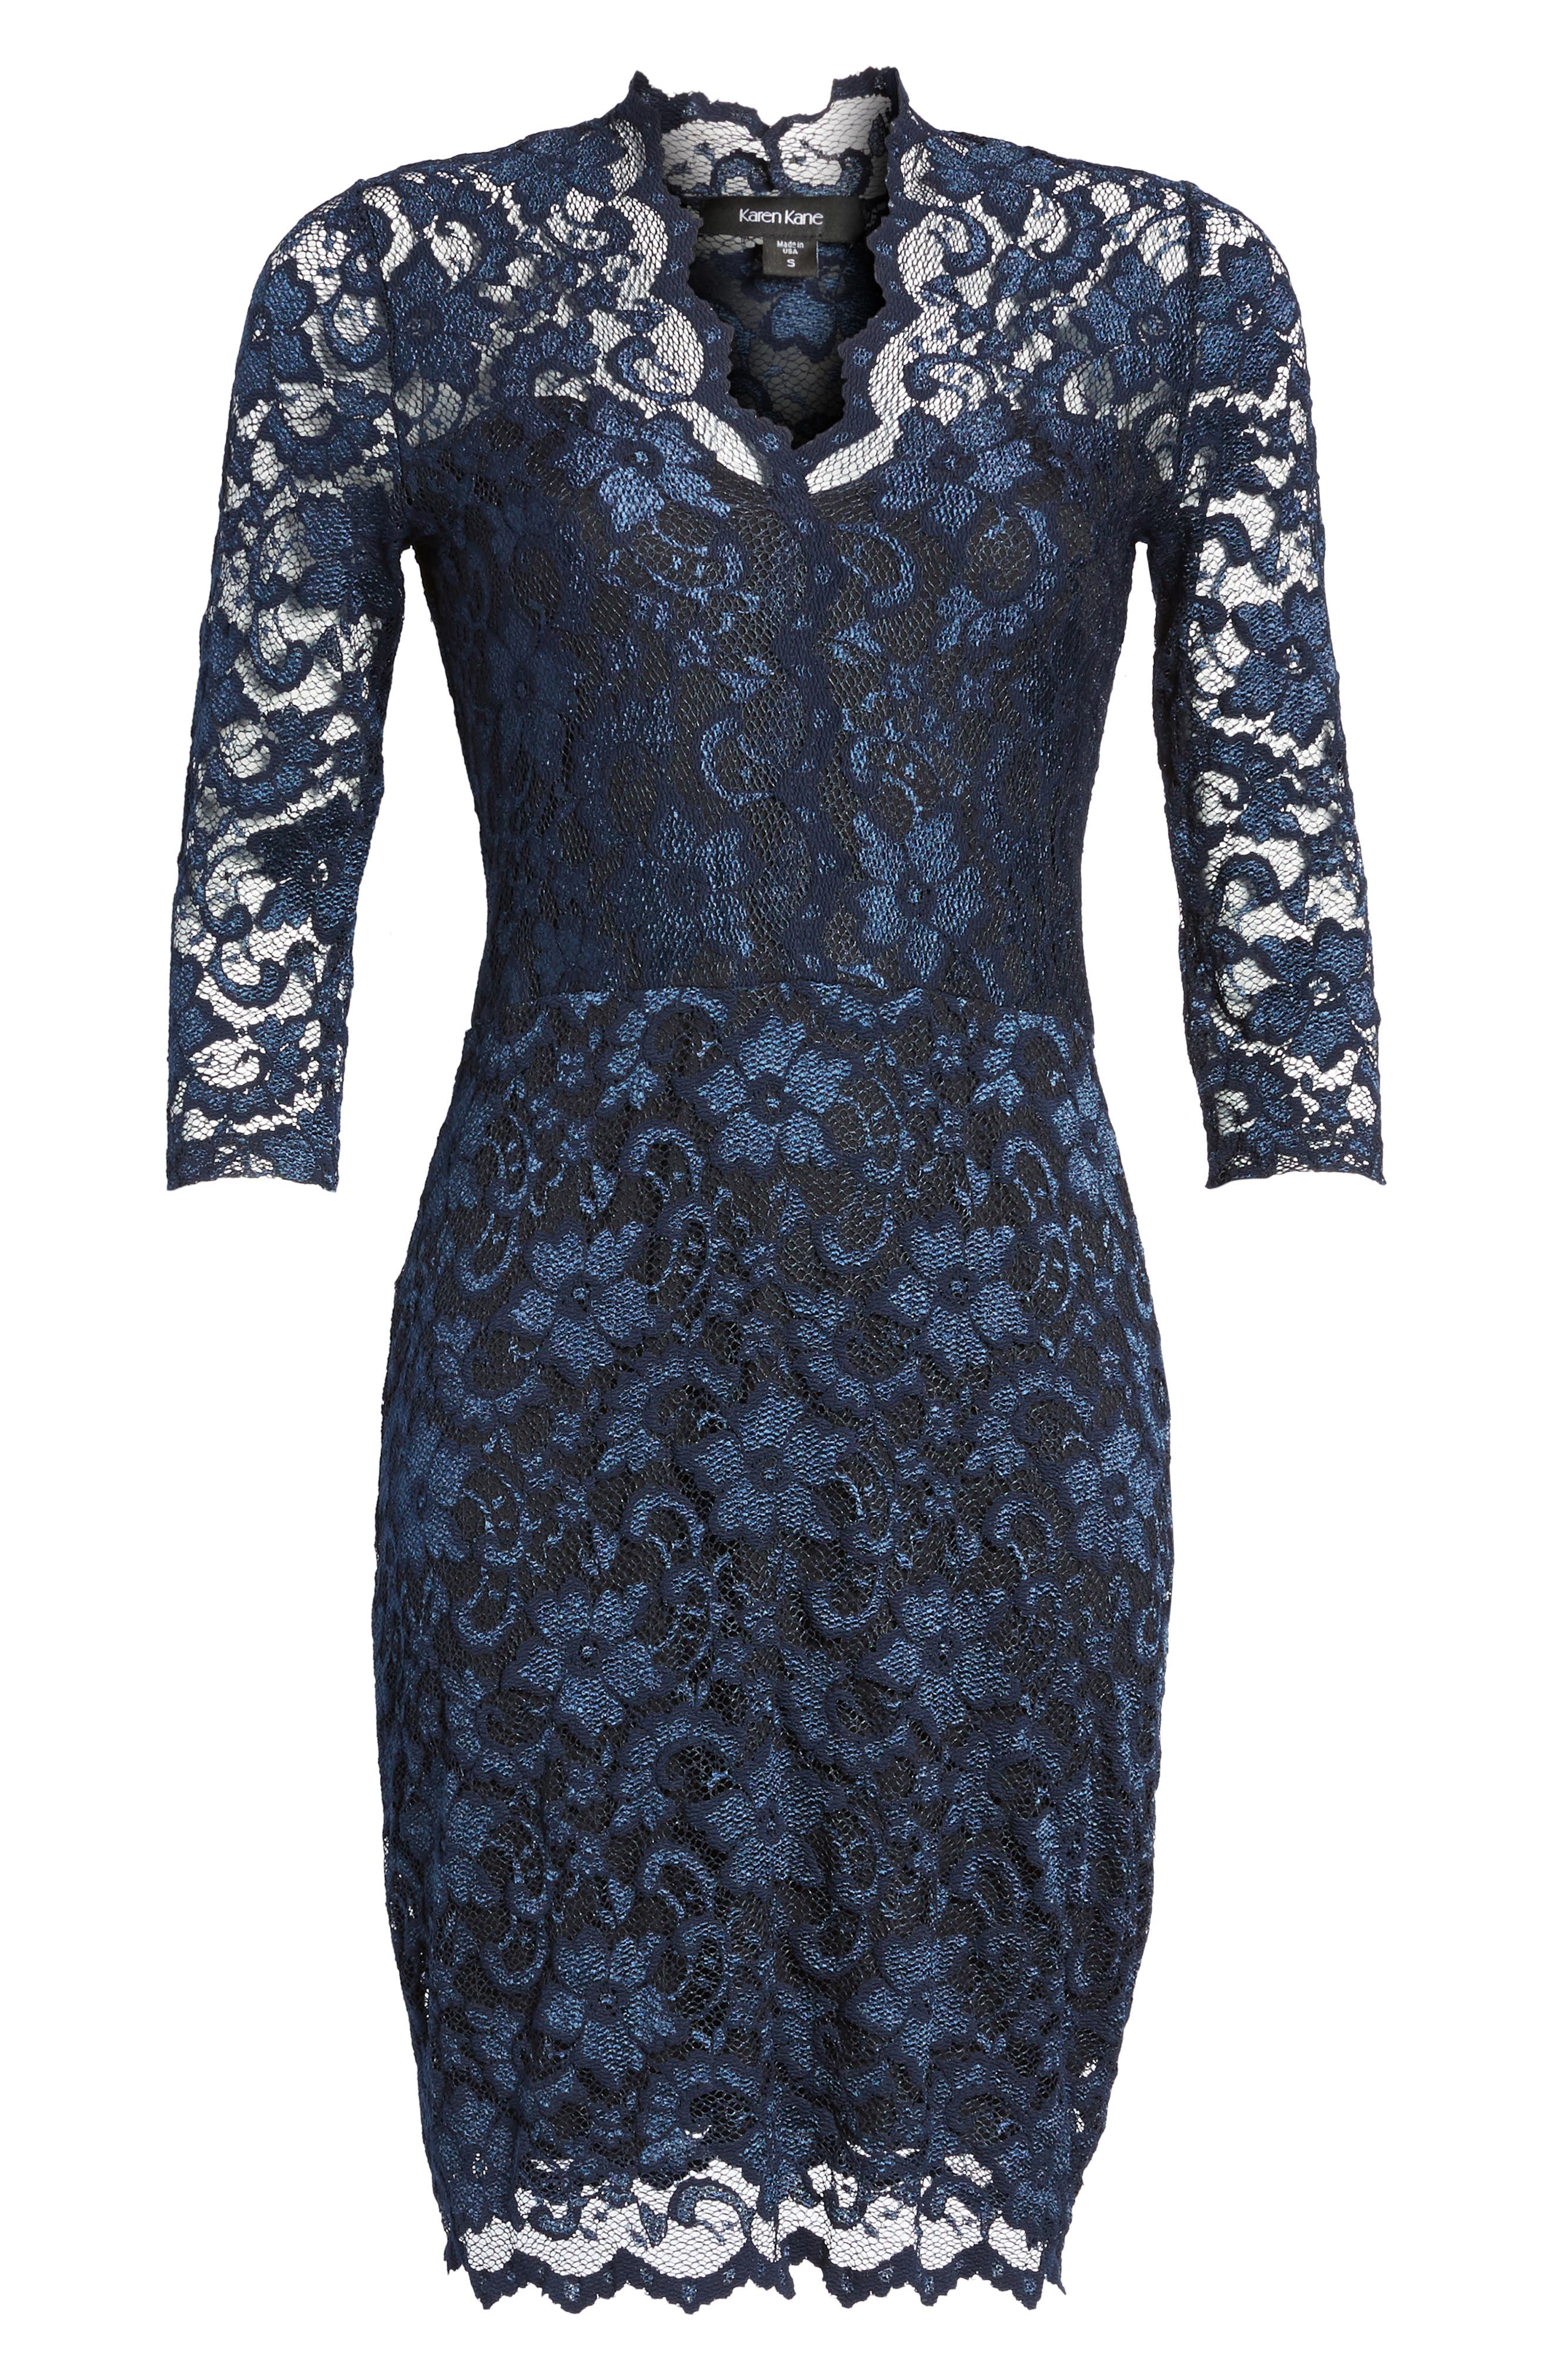 Karen Kane Scalloped Lace Sheath Dress, Blue